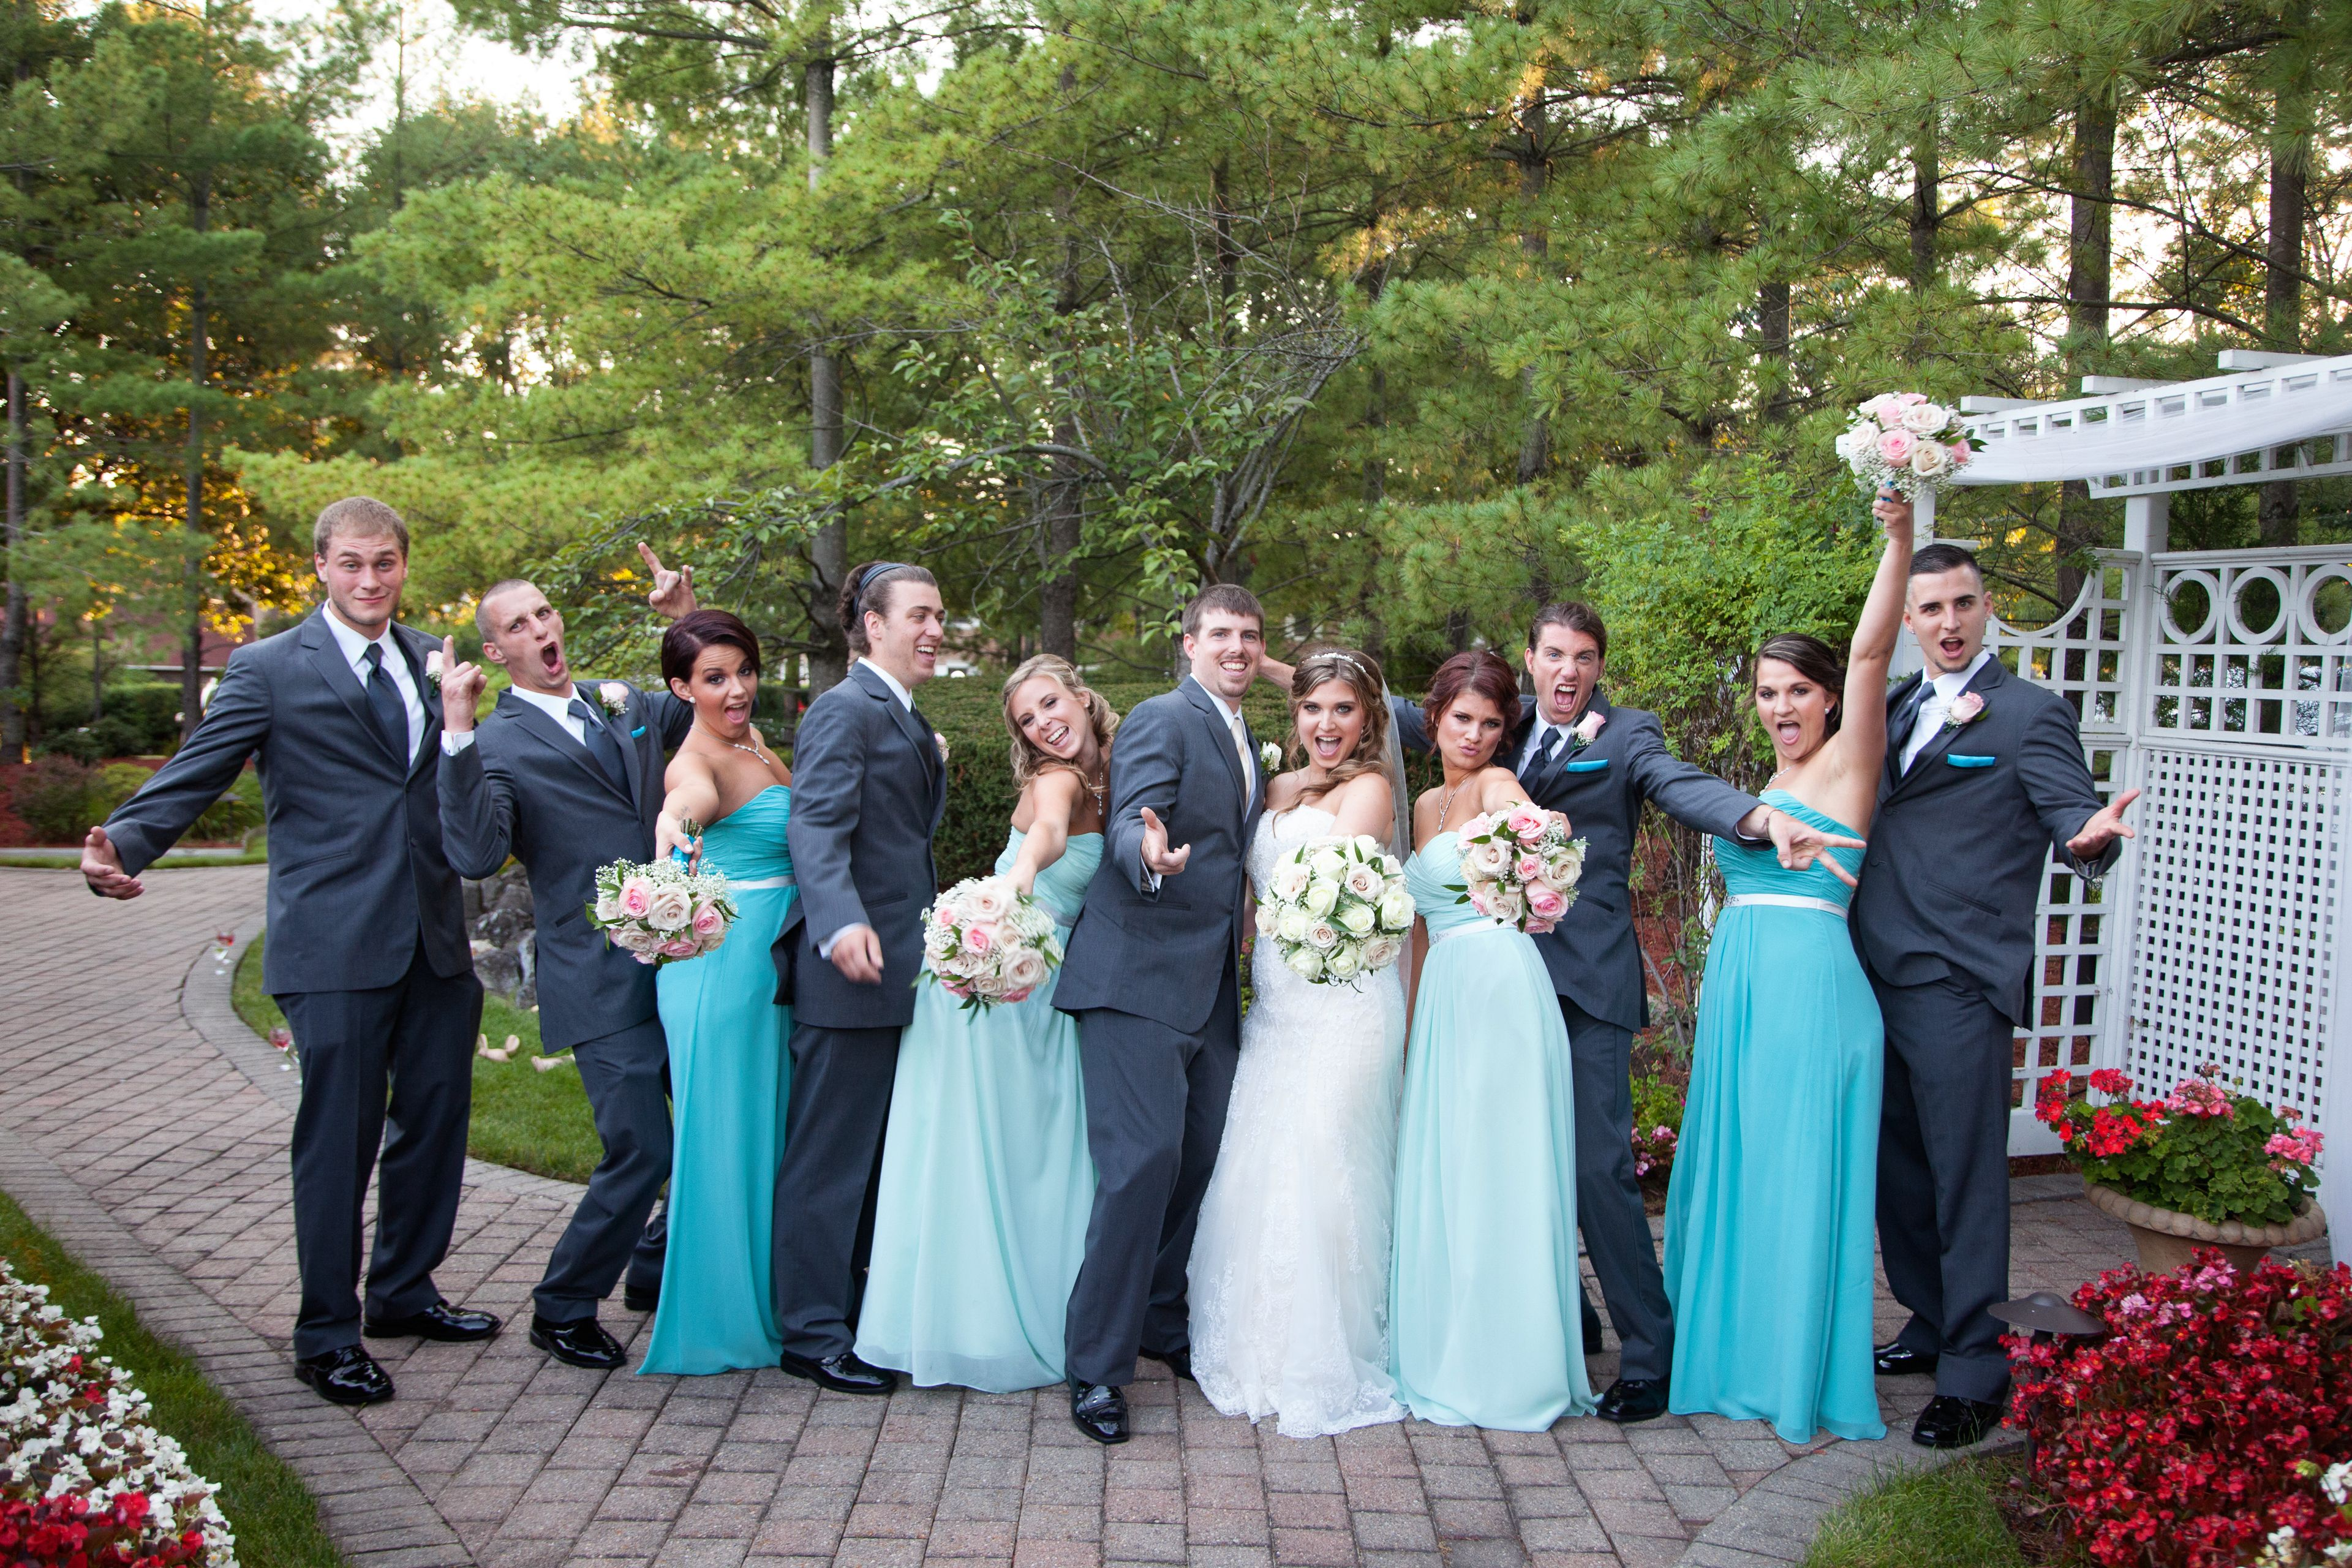 Kim's bridal party